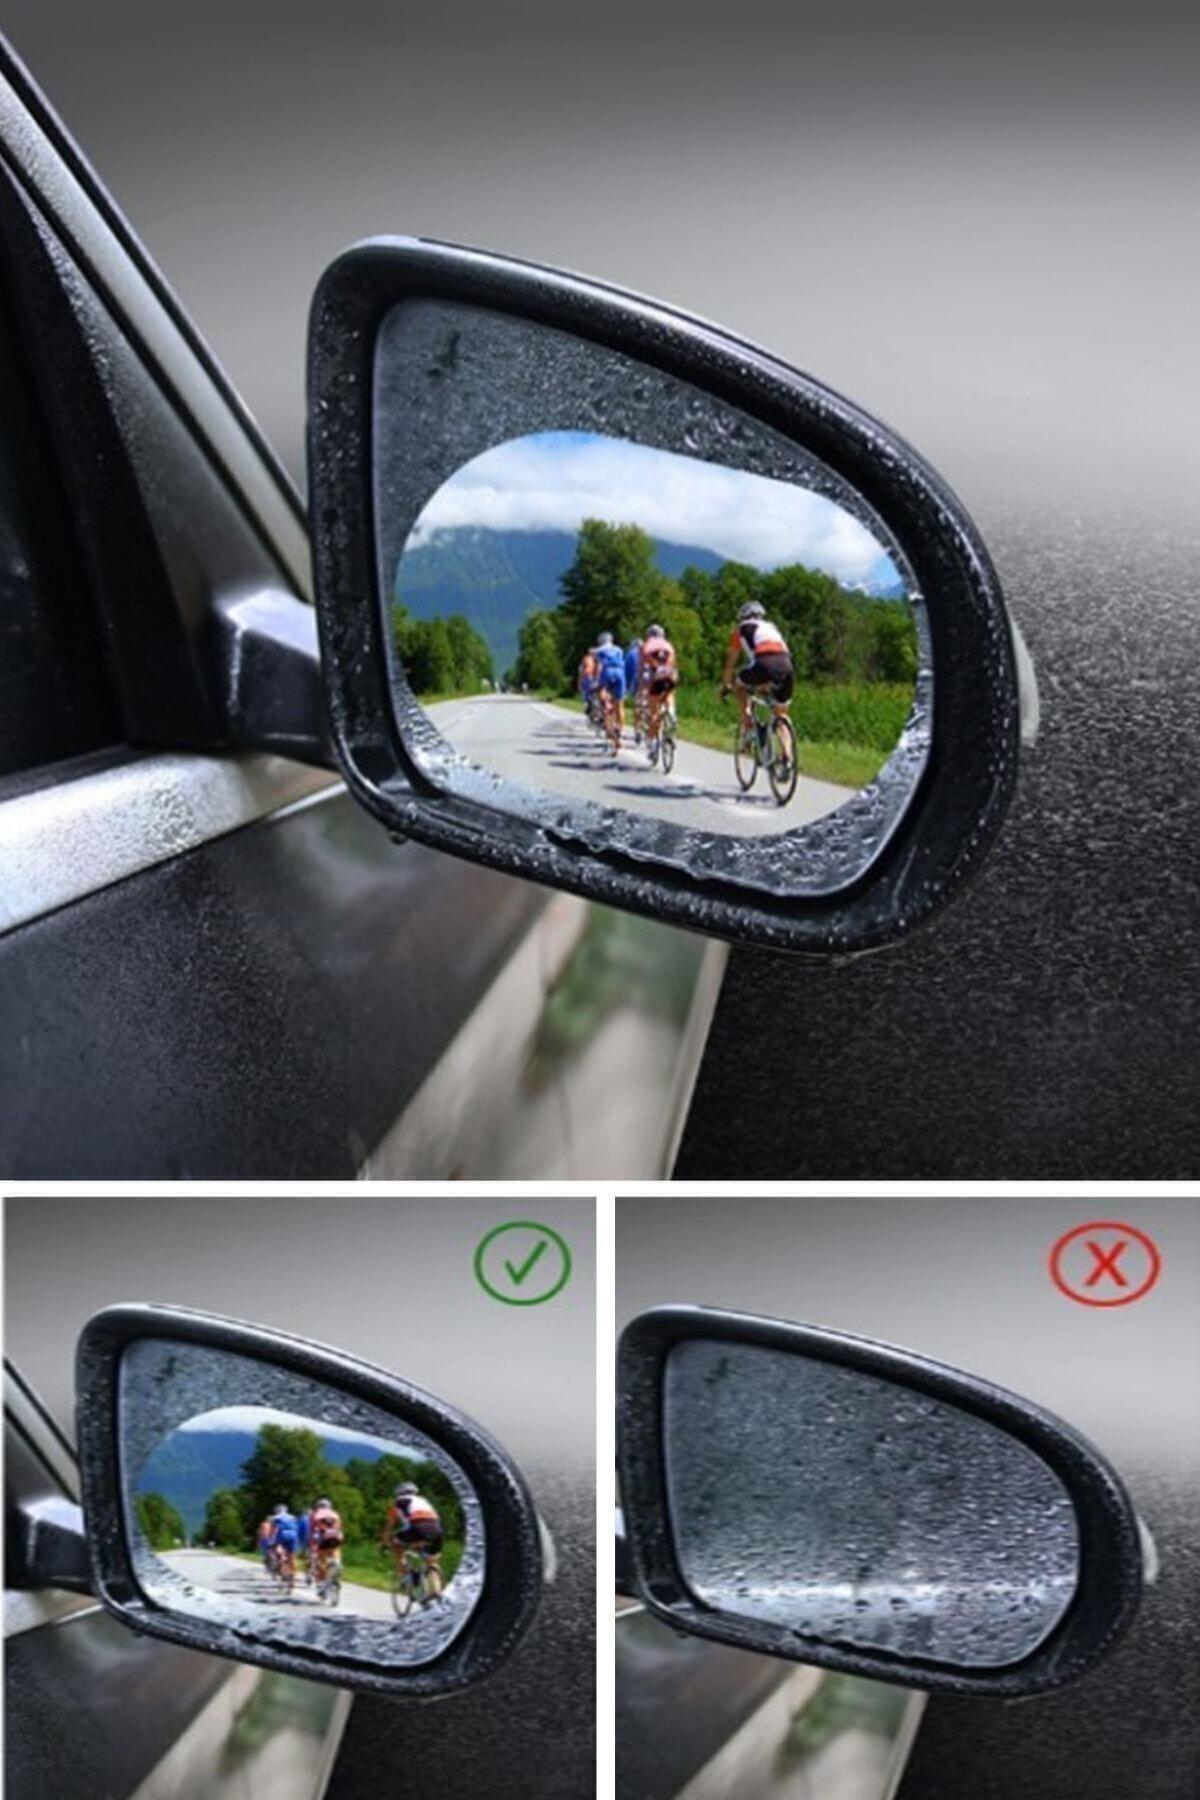 İndirimKap Oto Dış Ayna Yağmur Tutmaz Kaydırıcı Film 2 Adet (Sağ/sol) 1